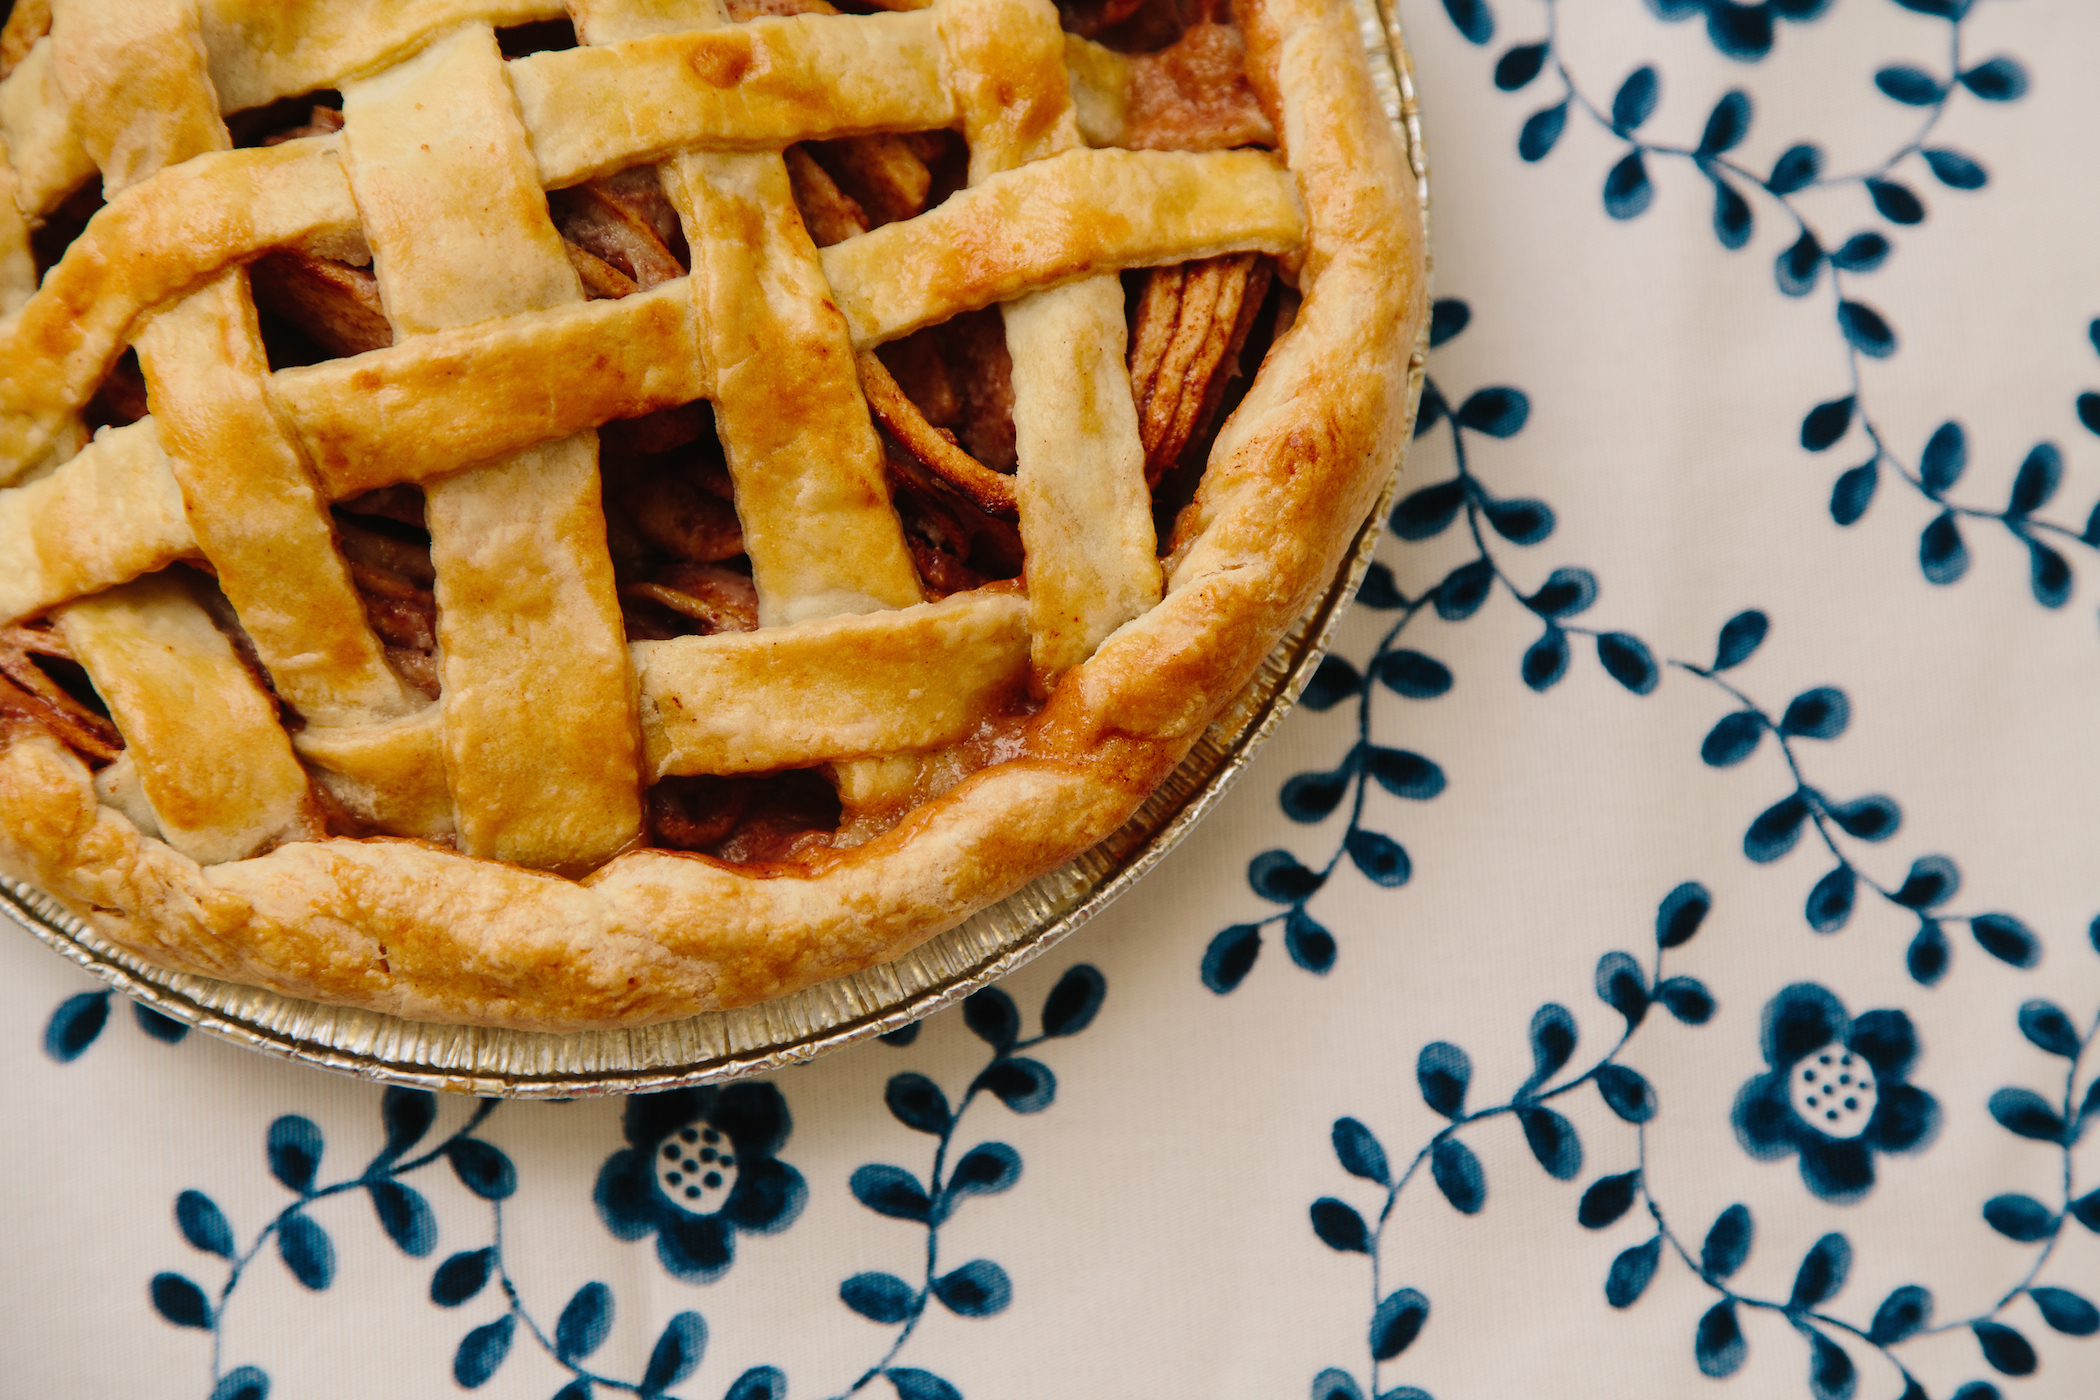 Pies and Tarts -